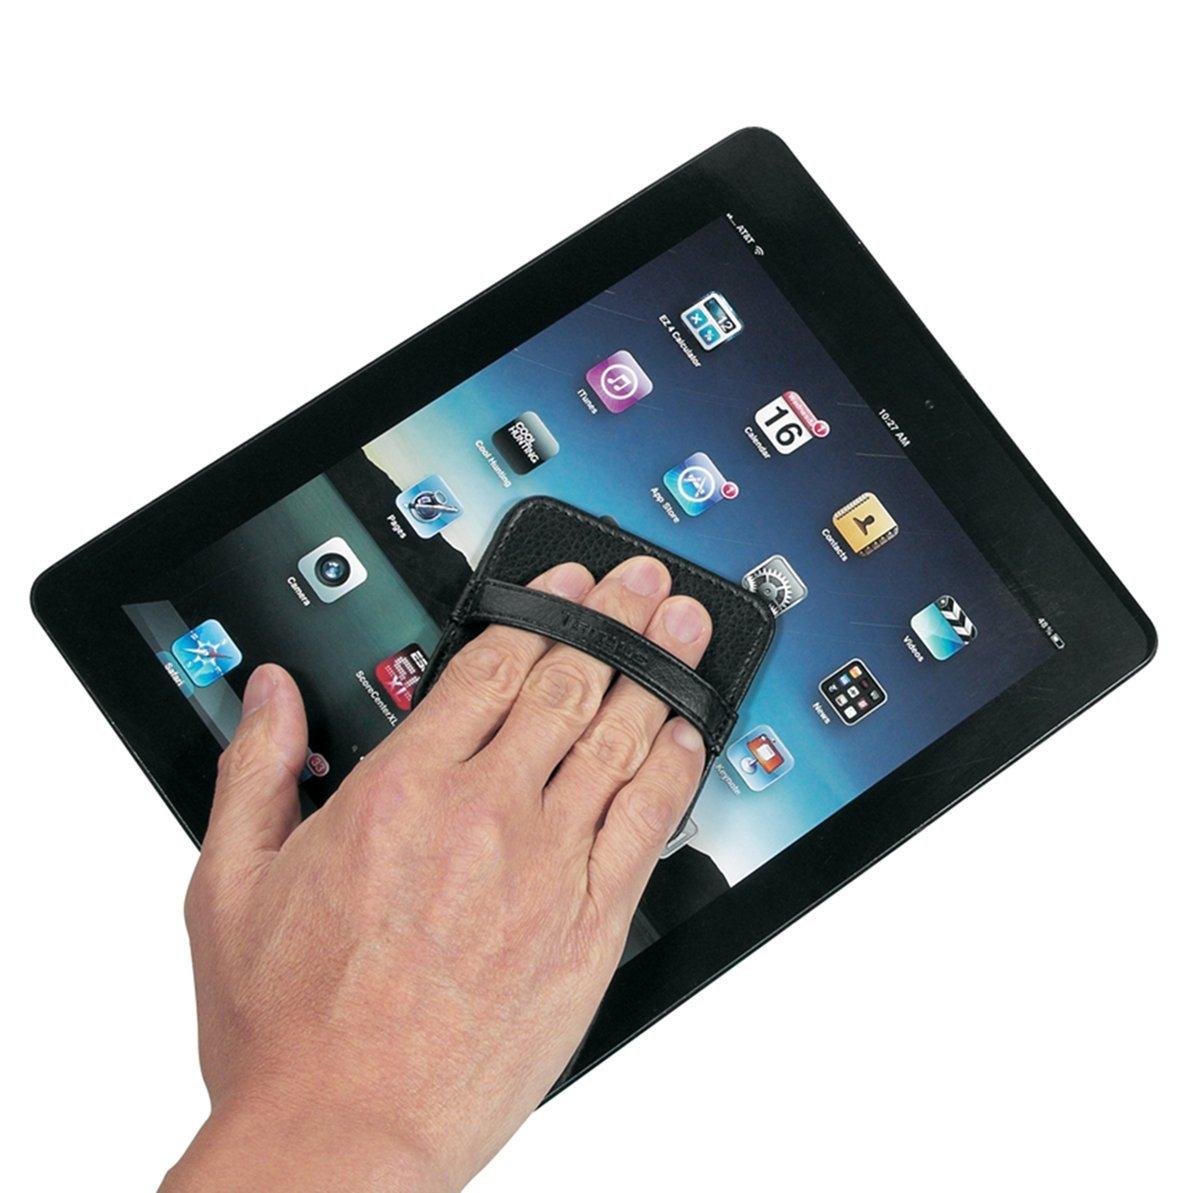 Targus CleanVu Proteggischermo per Tablet/PDA/eBook Reader 1646428 acc accessori ipad